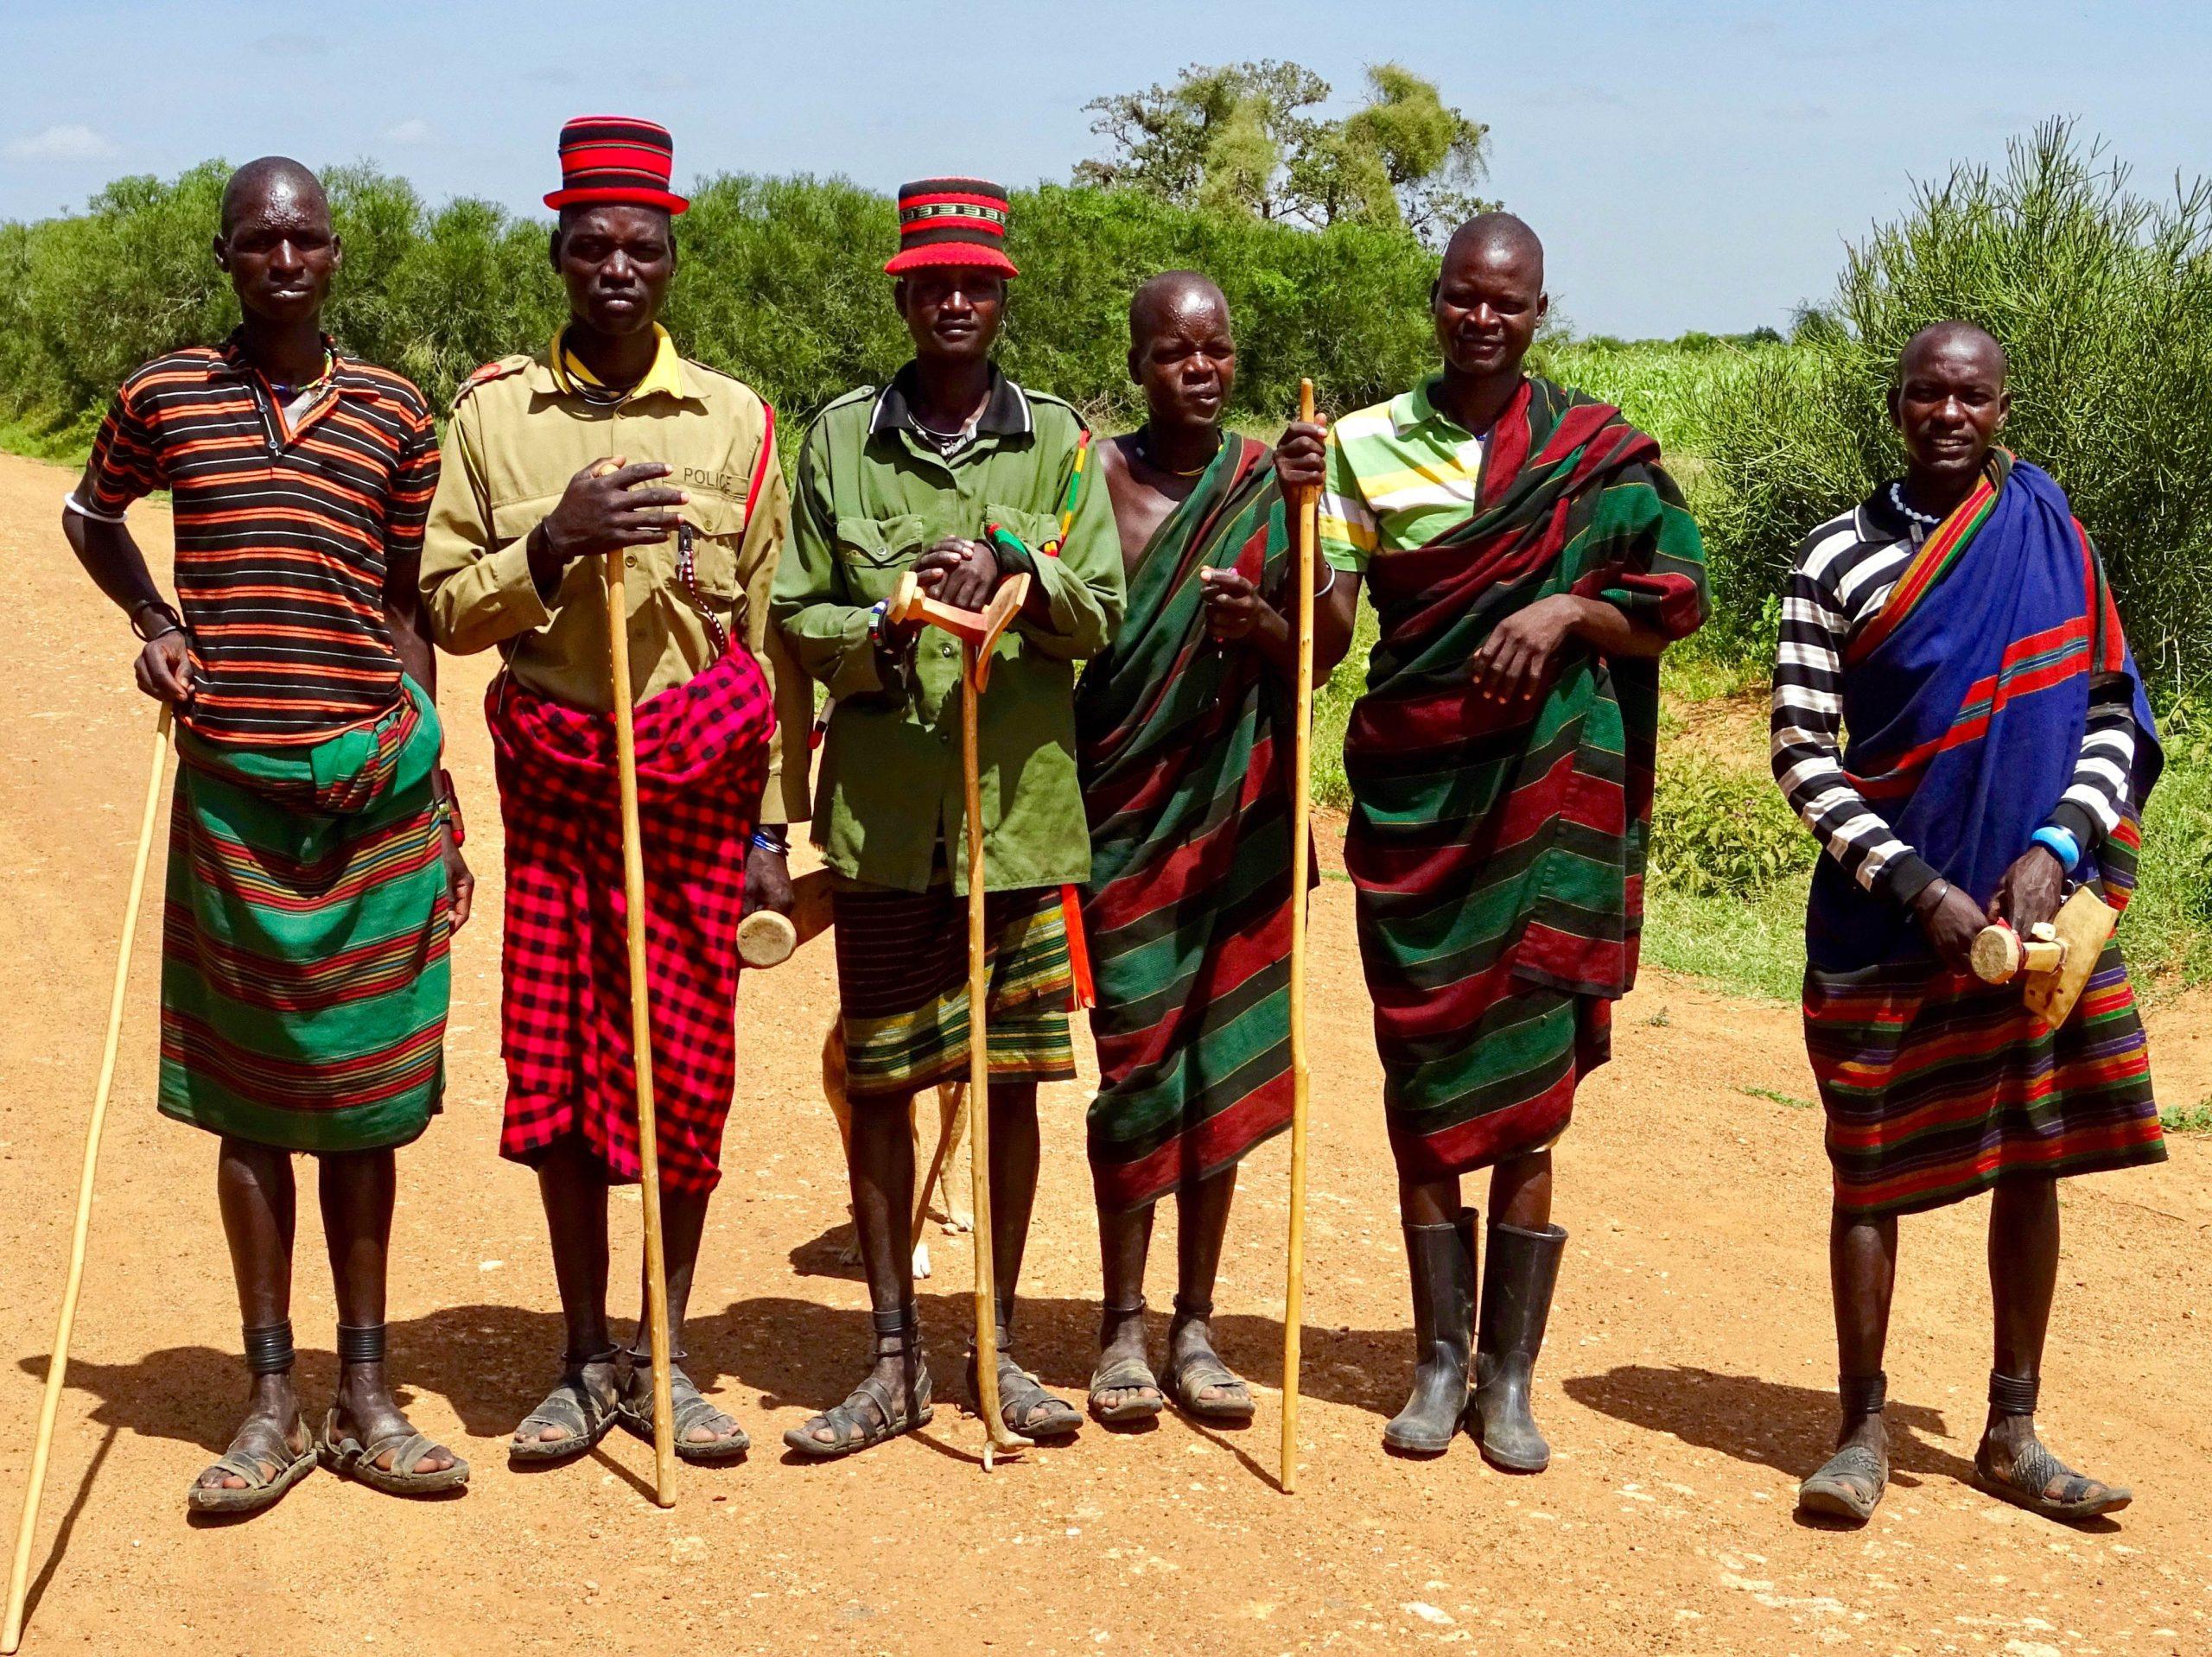 Karamajong herders in traditioneel tenue poseren